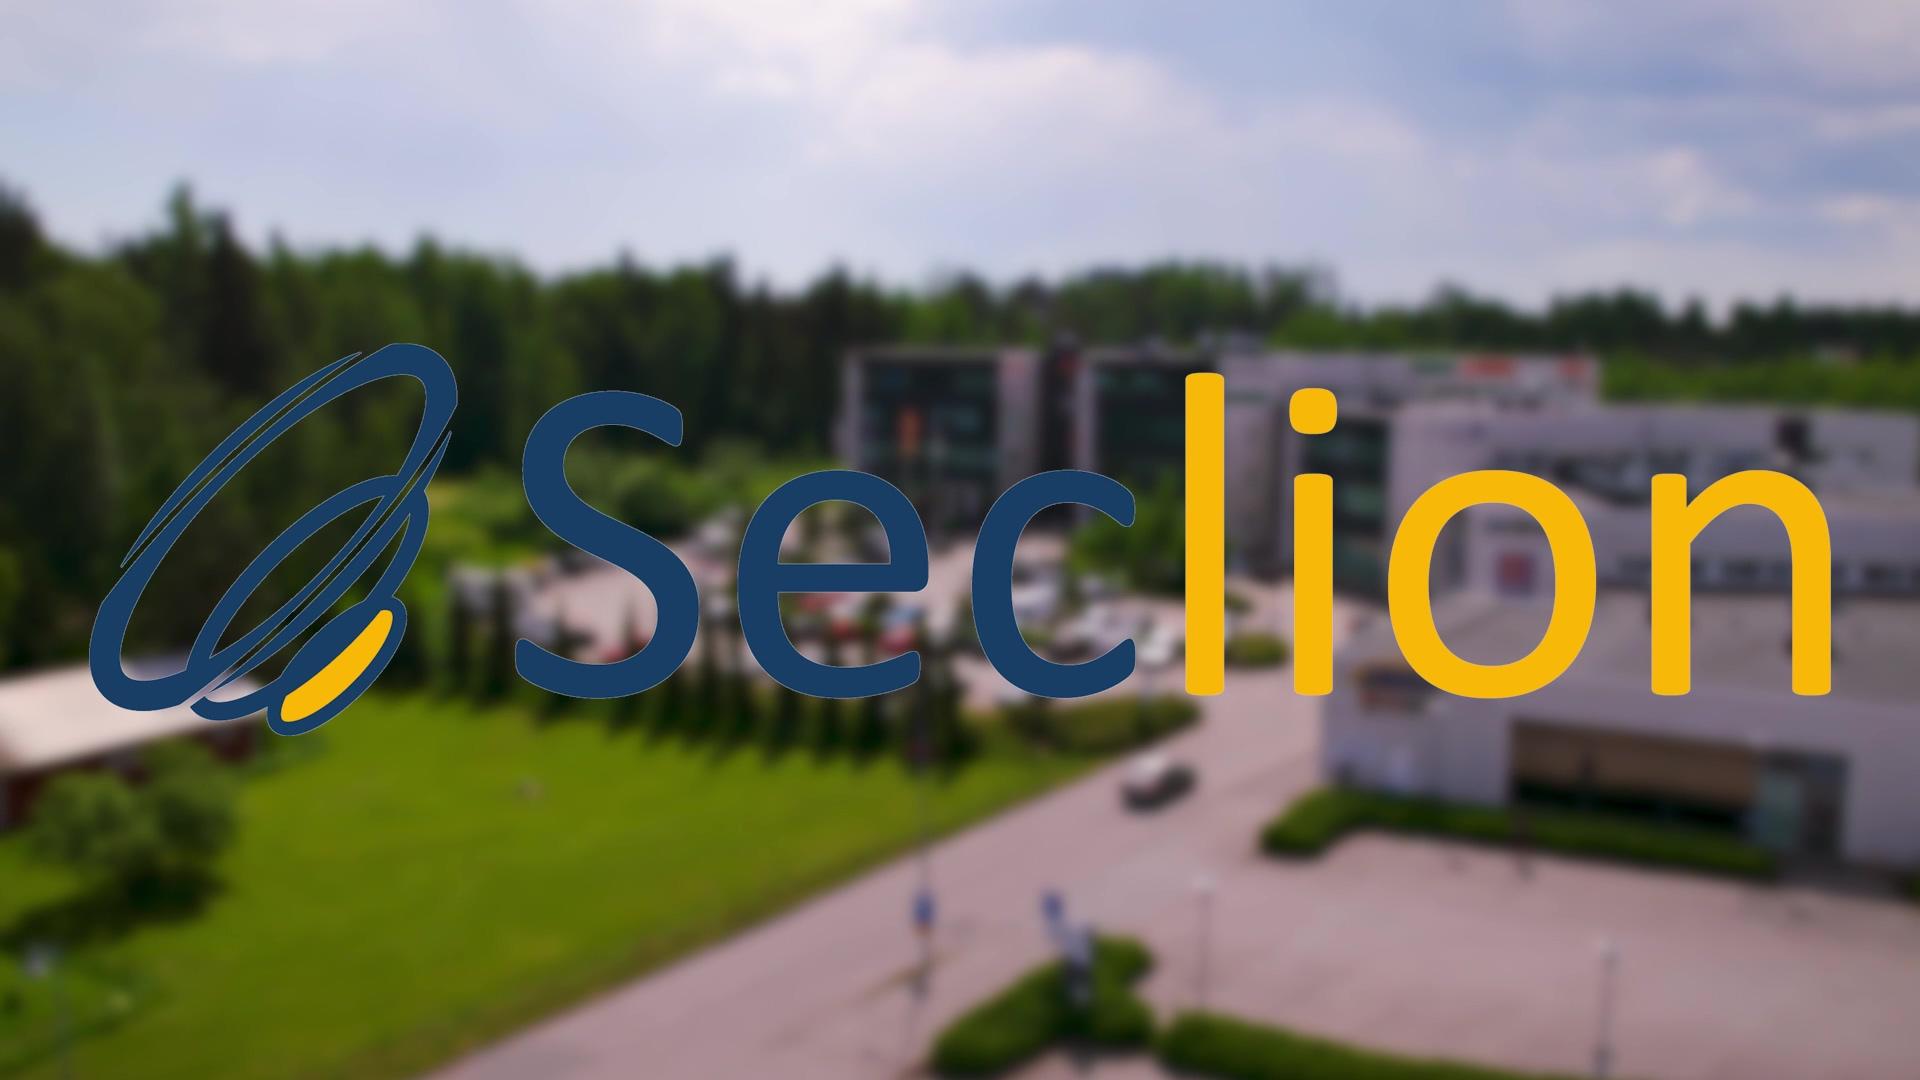 Seclion_Yritysesittely